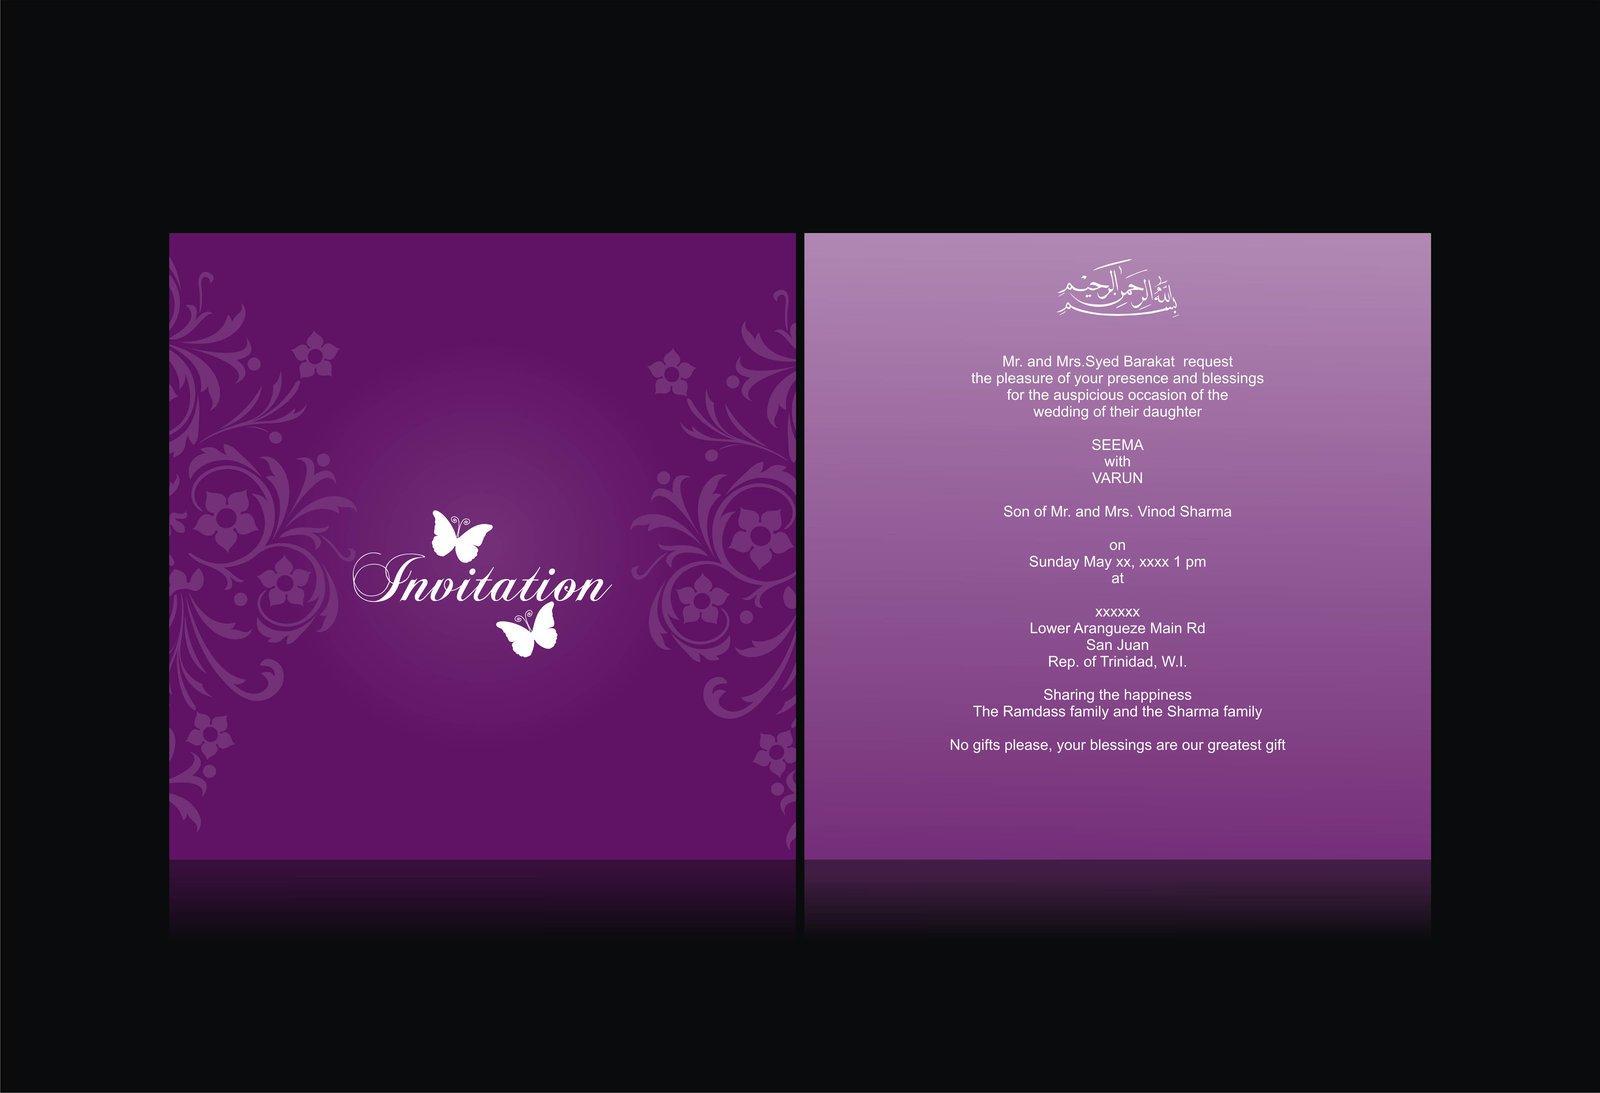 Wedding invitation card design wedding invitation card design template free download 1600 x 1093 stopboris Choice Image